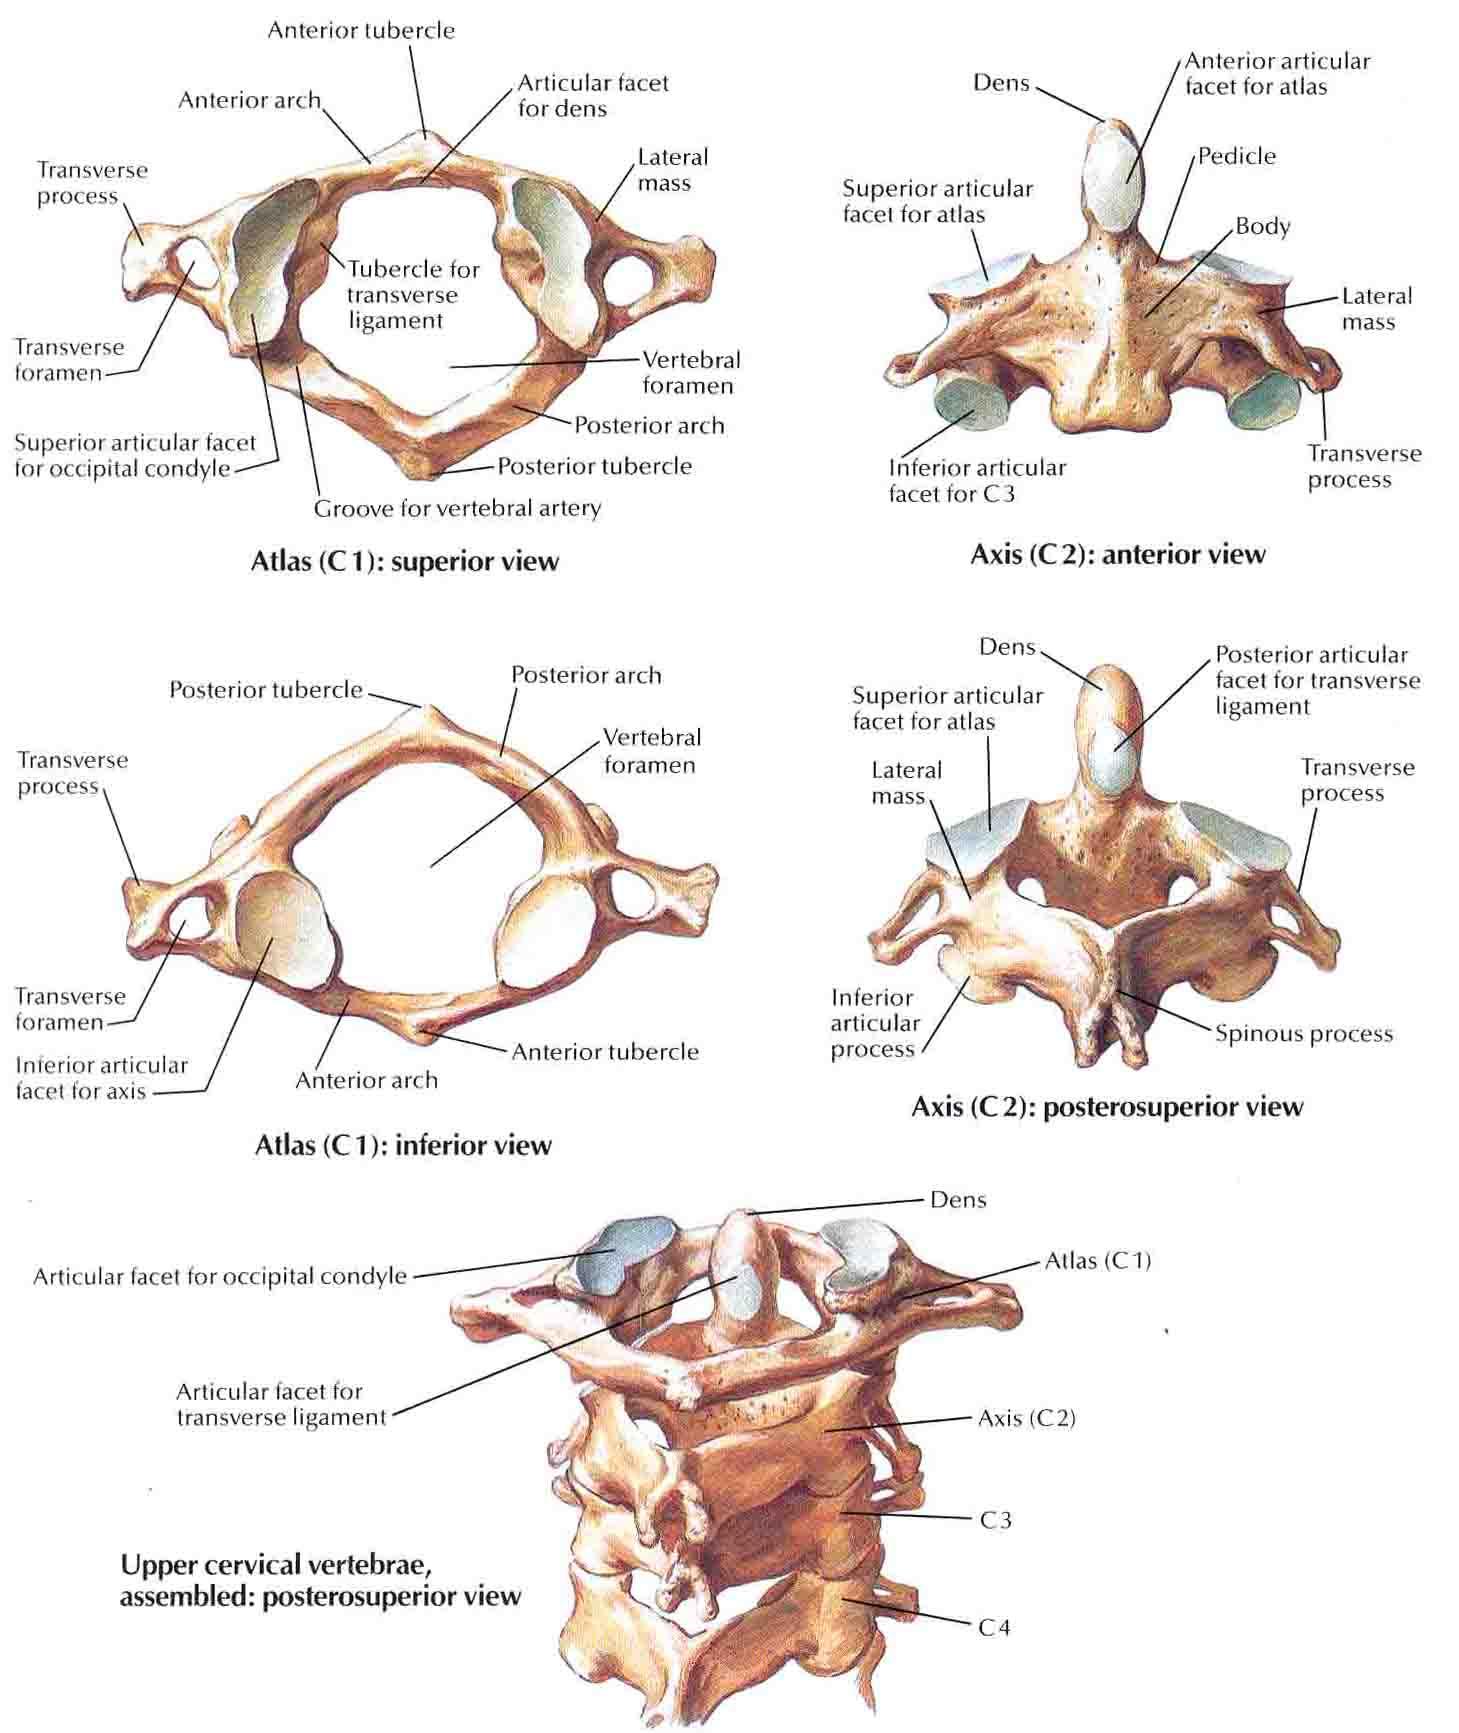 Spine & Back:Bones:Cervical vertebra including atlas and axis ...